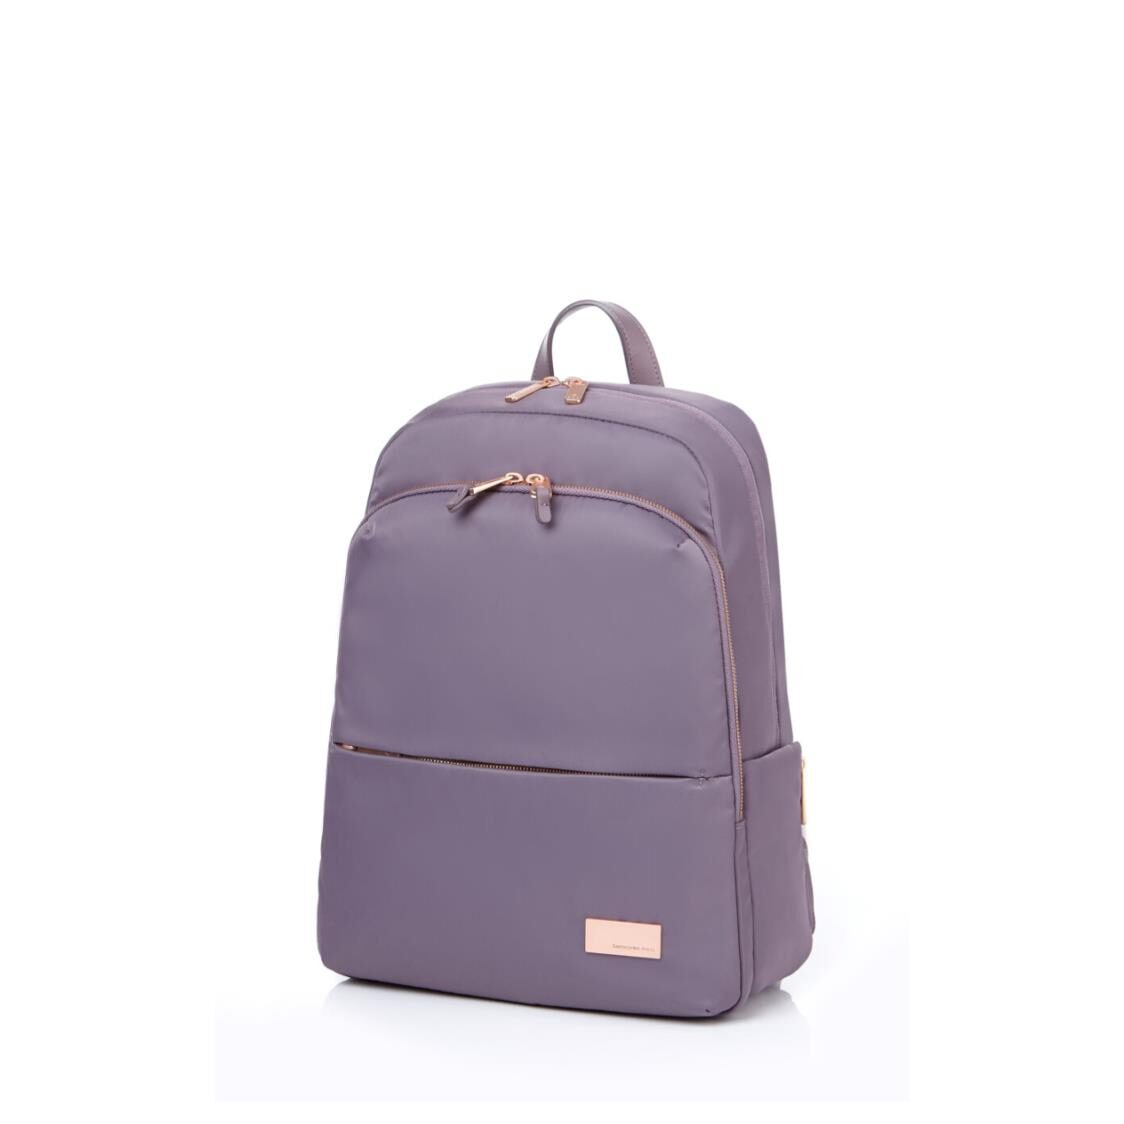 Samsonite Red Reny Backpack GV191001